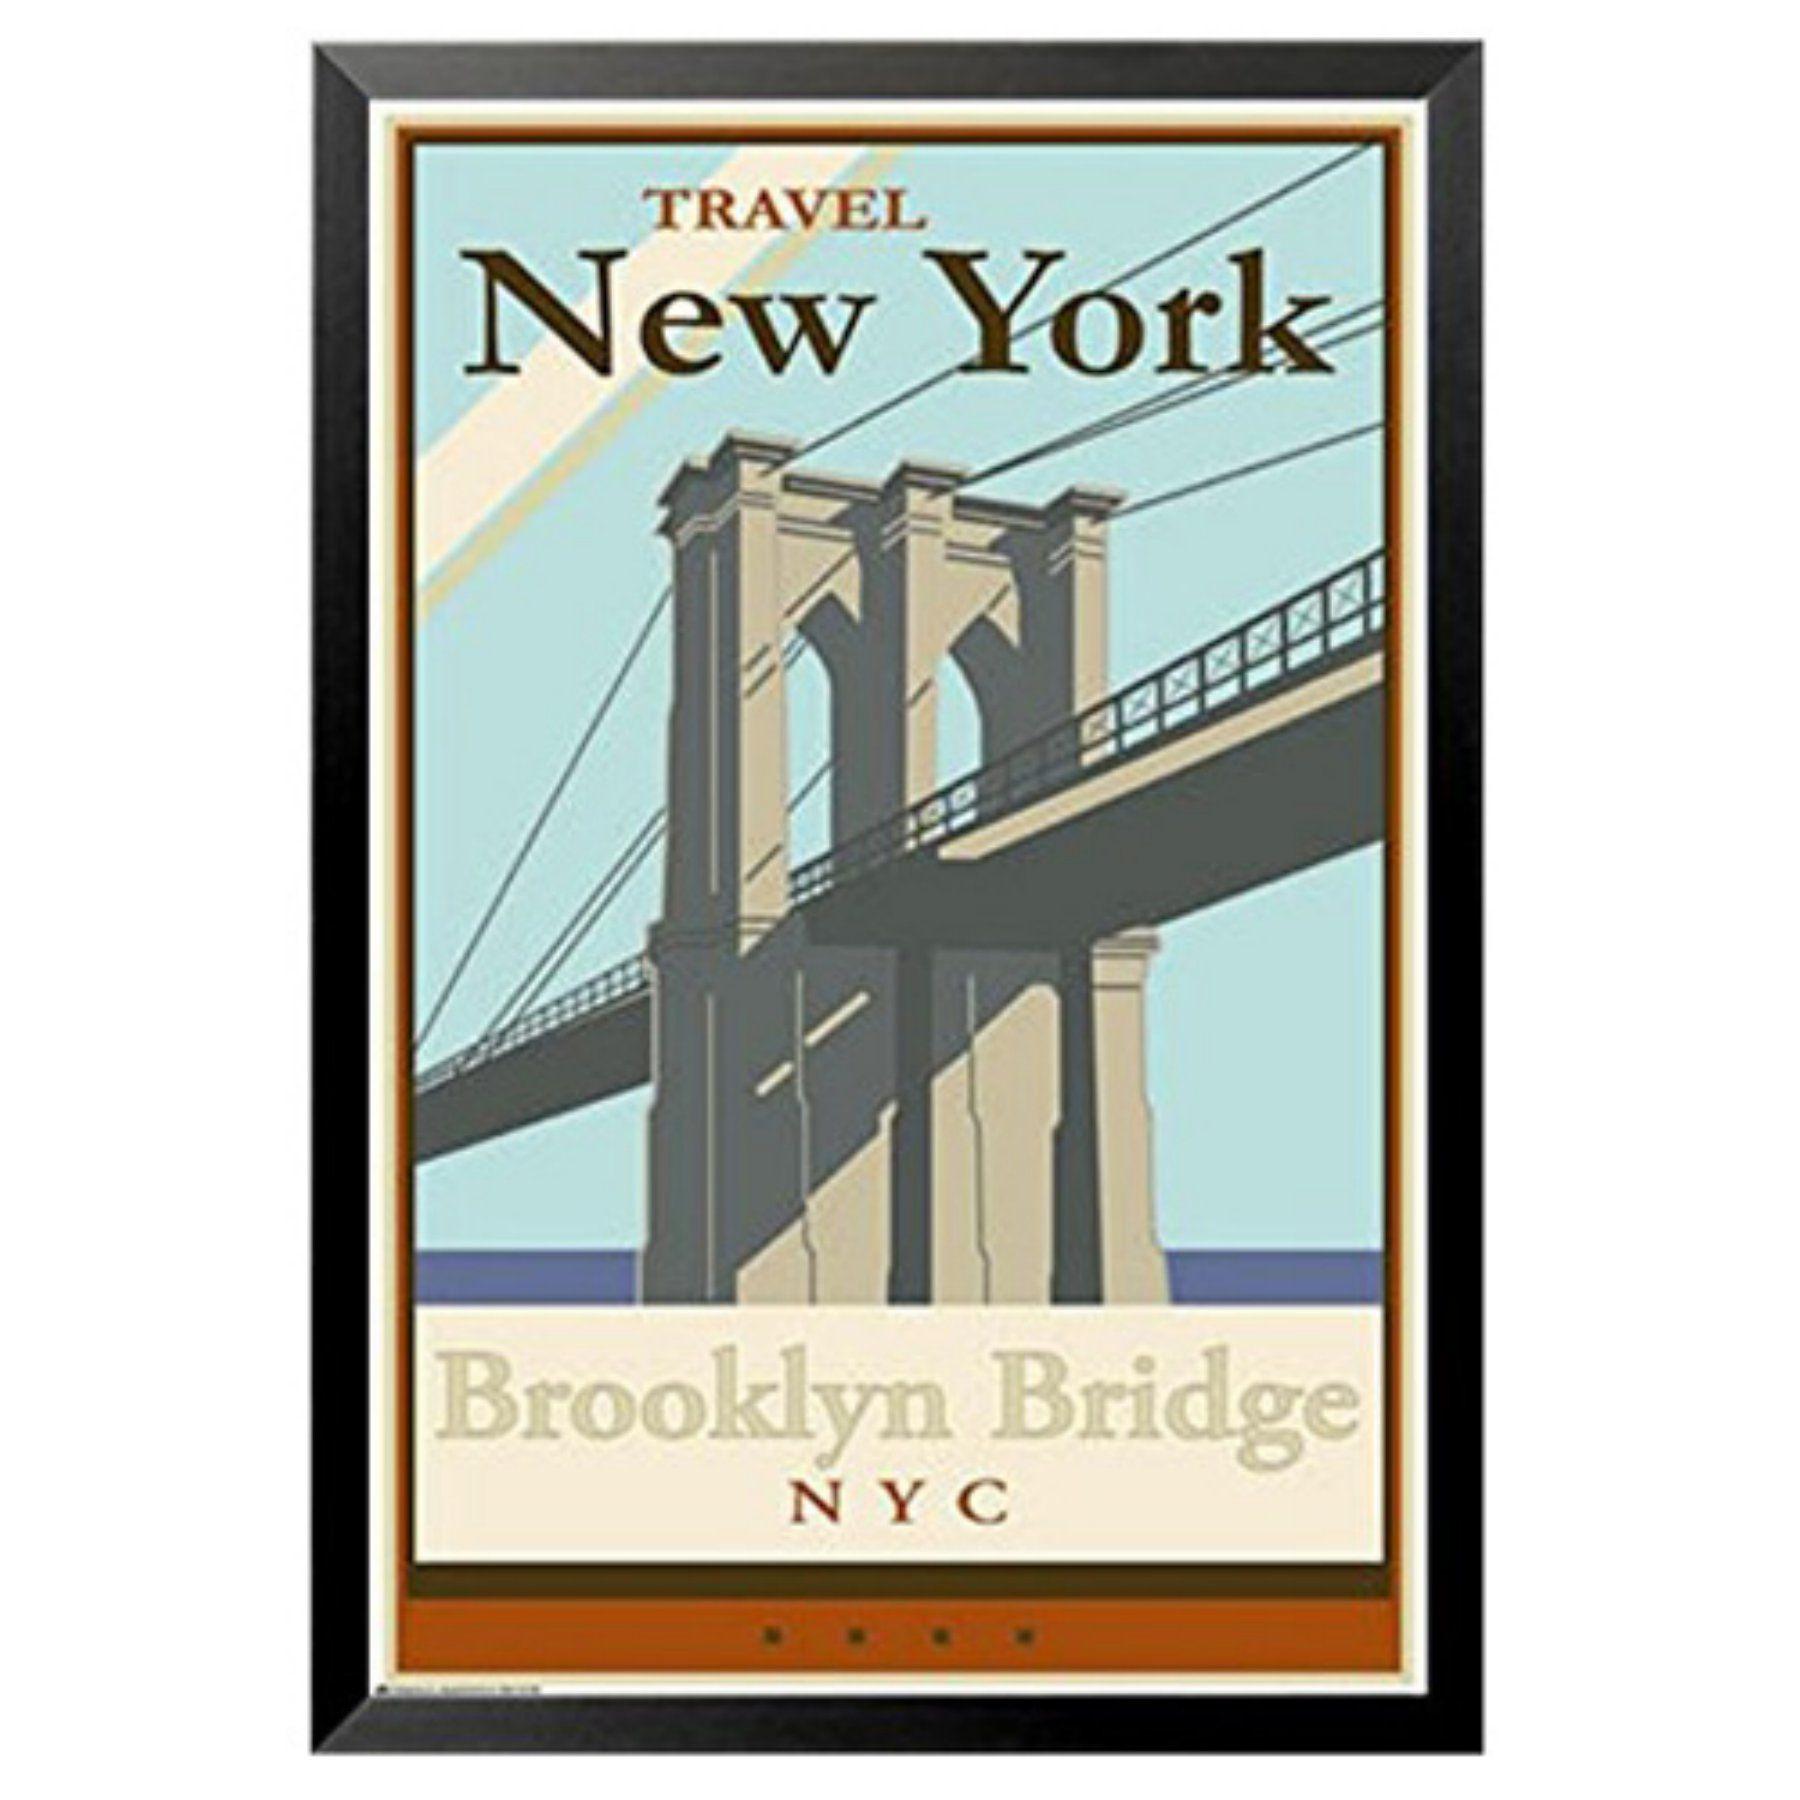 buyartforless Travel New York City - Brooklyn Bridge Framed